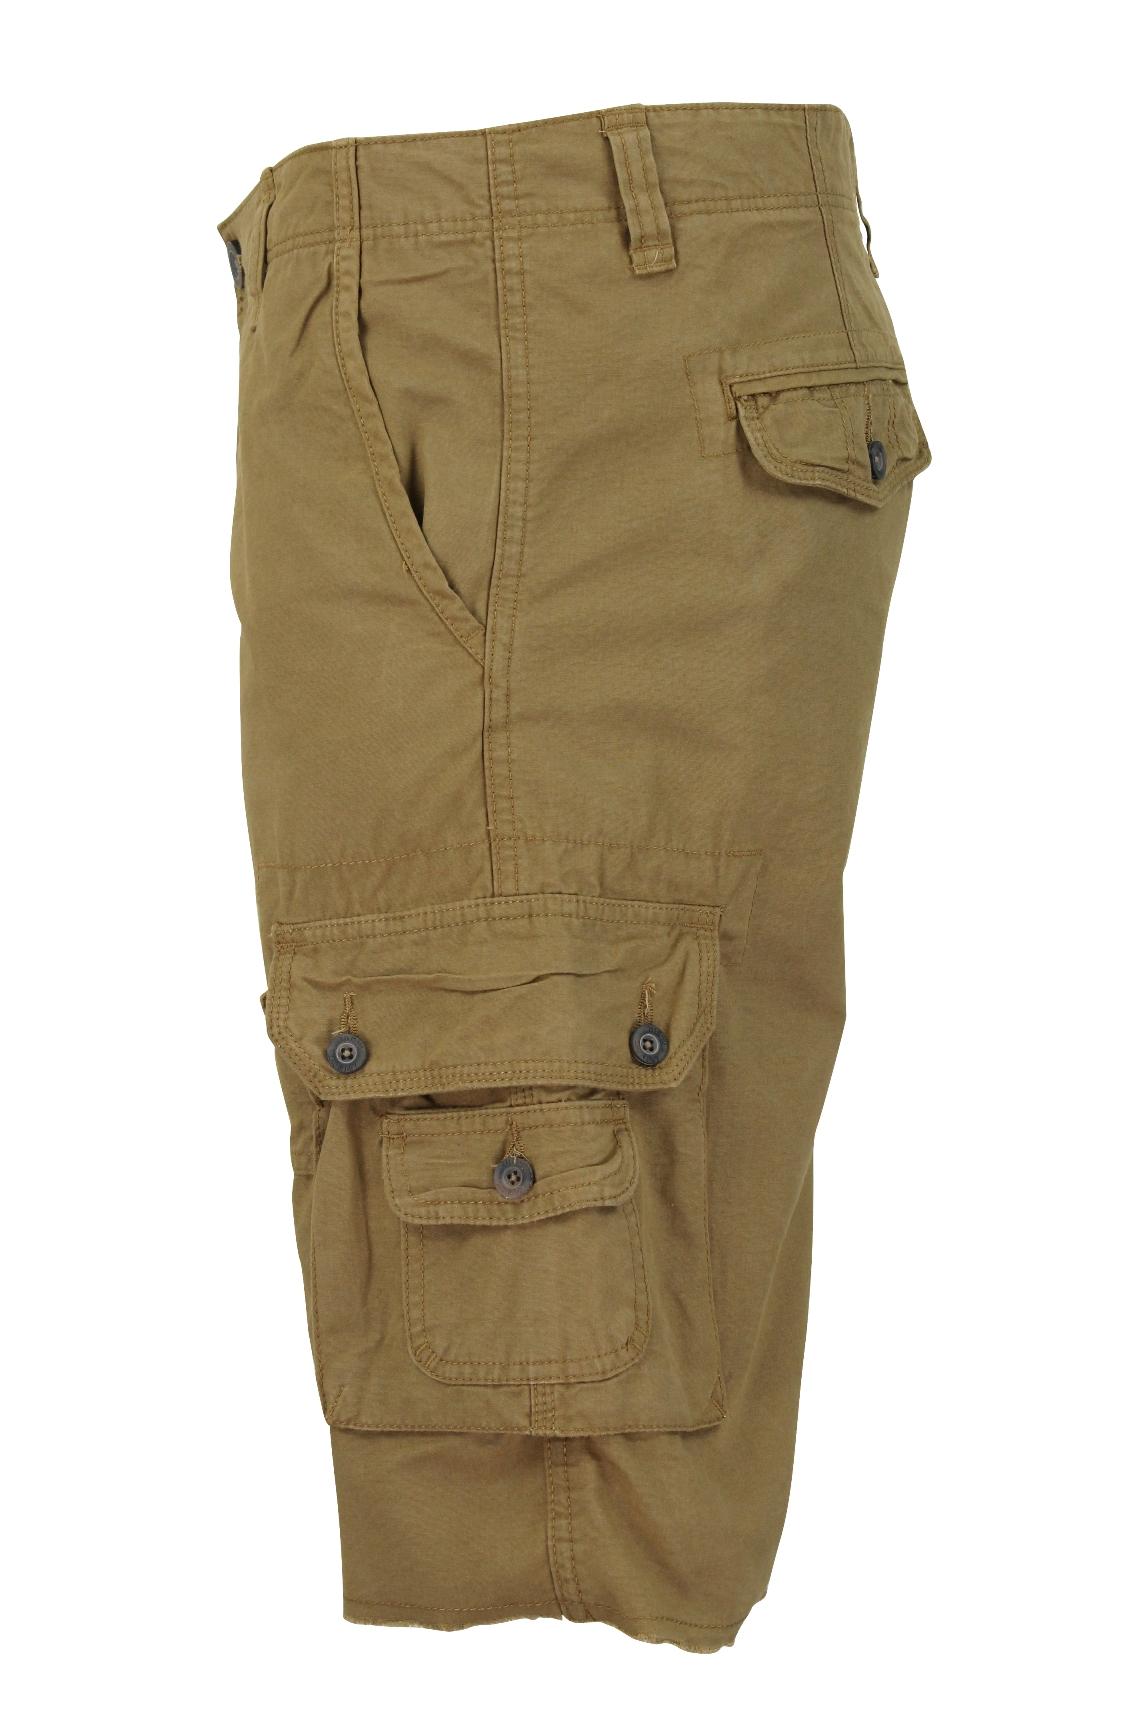 Mens Cargo Combat Shorts by Tokyo Laundry 'Groves'